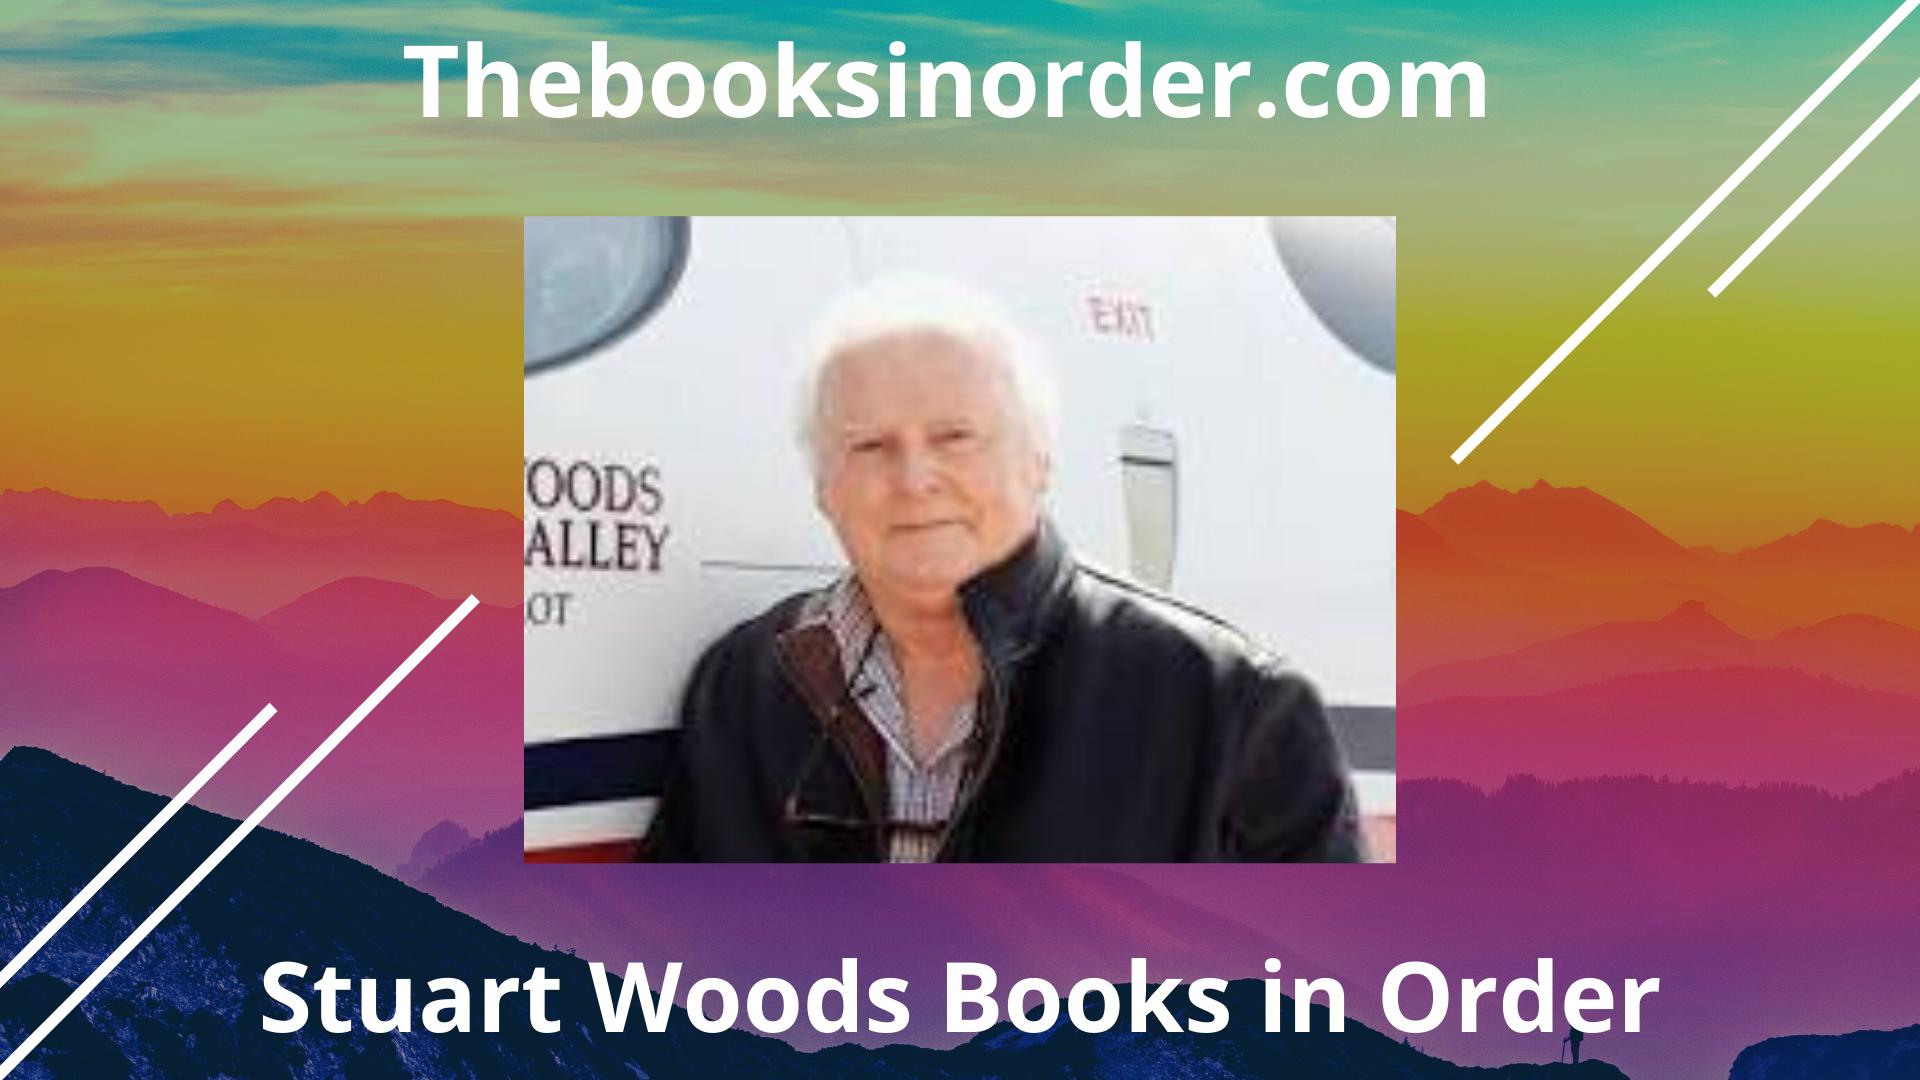 stuart woods book list, stuart woods books, stuart woods books in chronological order, stuart woods books in order